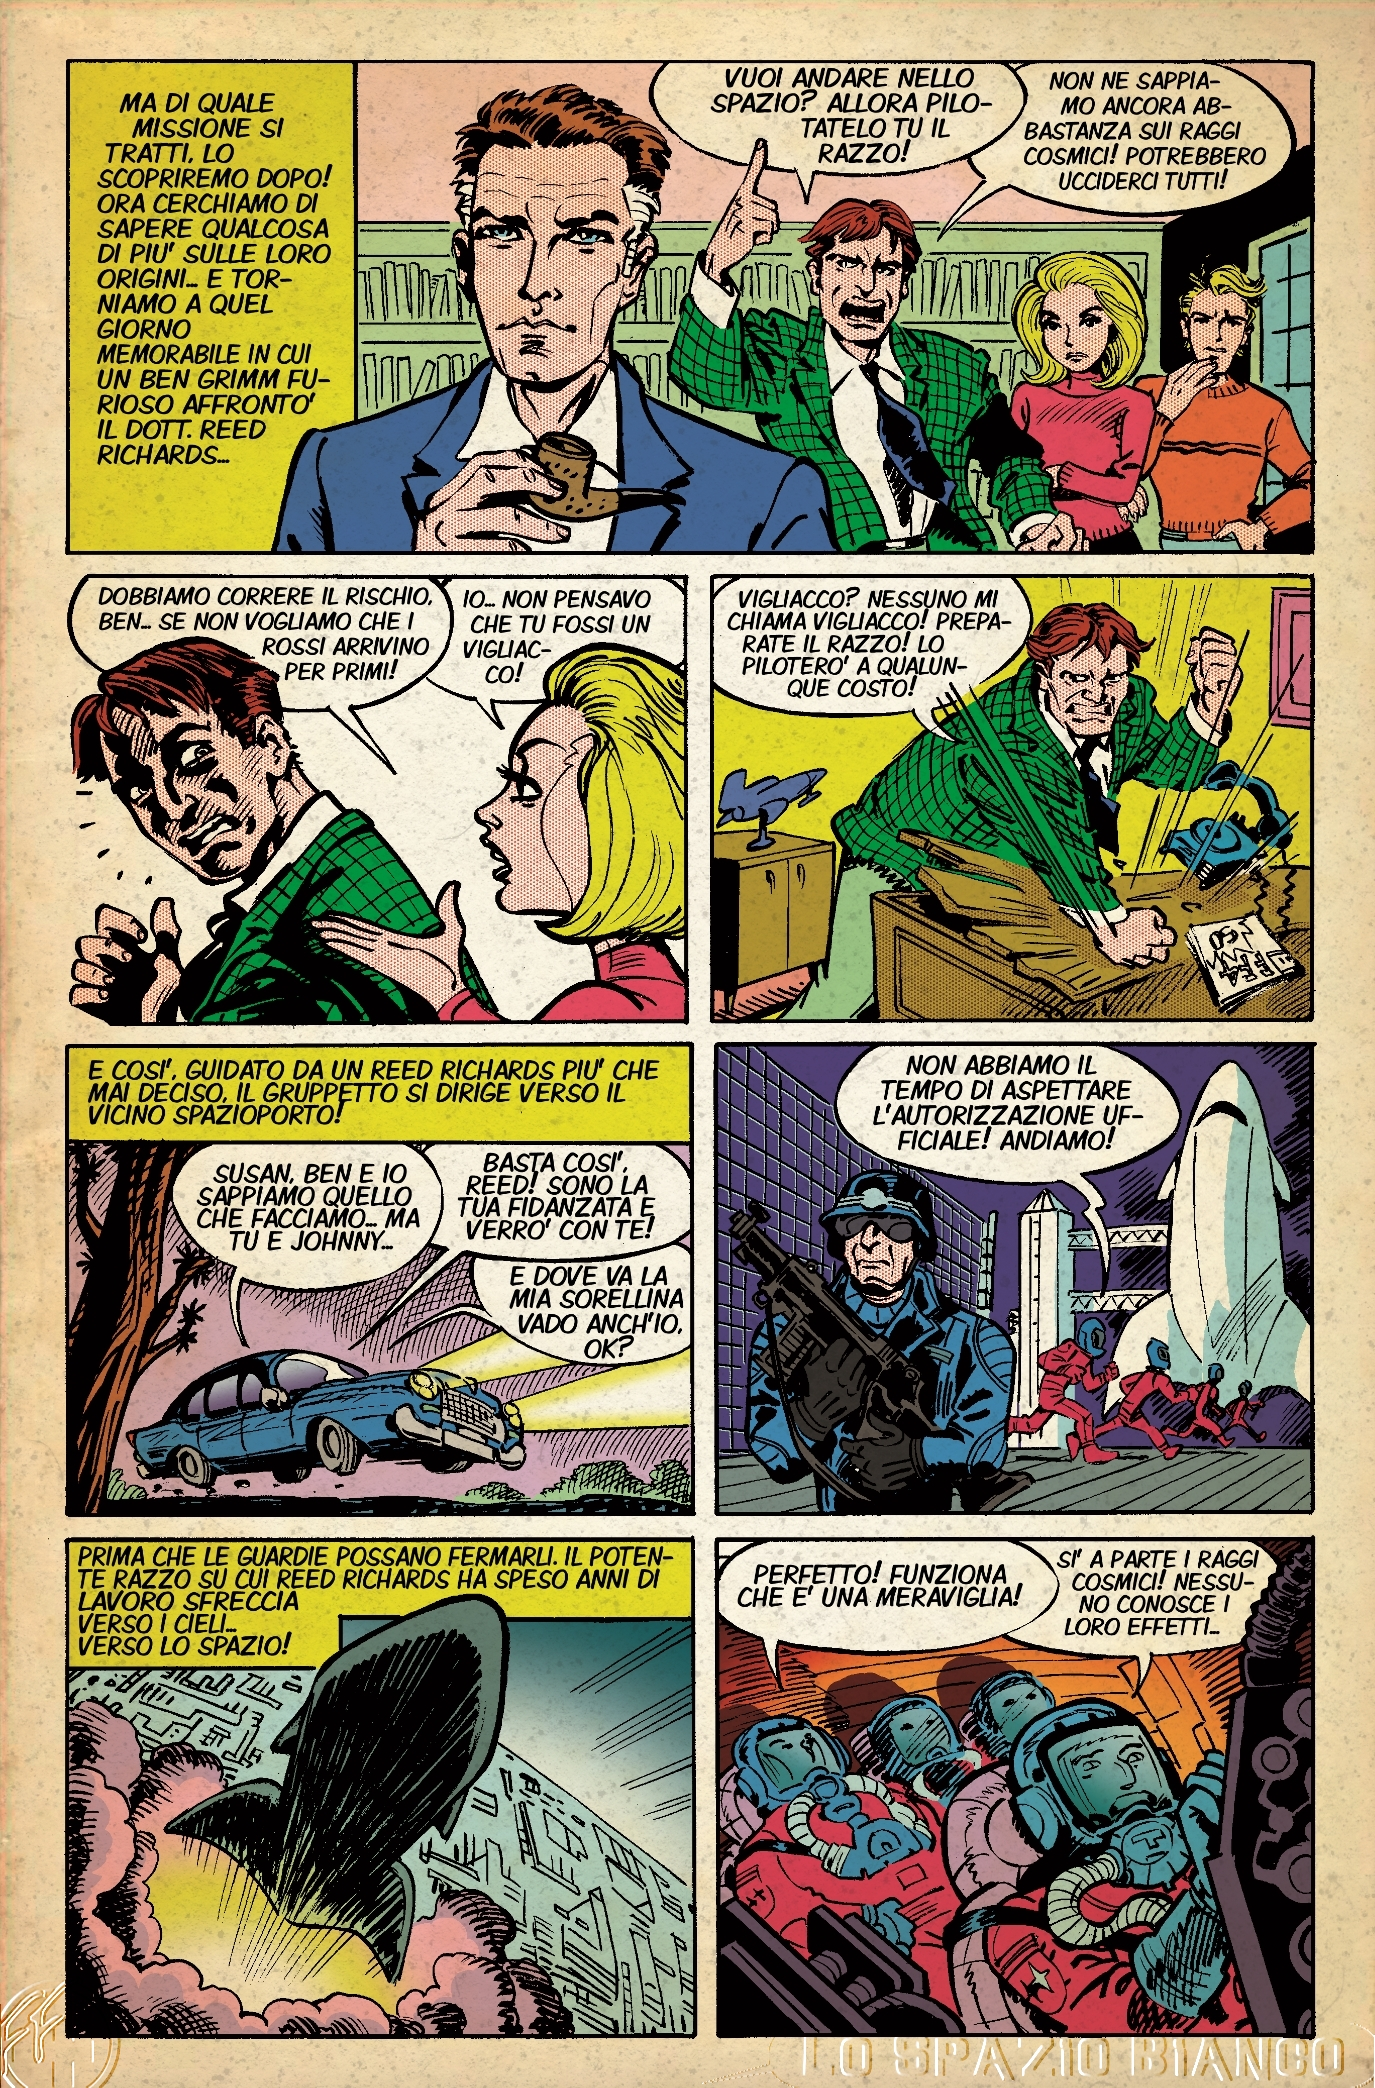 Fantastici Quattro n.1 Pagina 9 (Alessandro Gottardo)